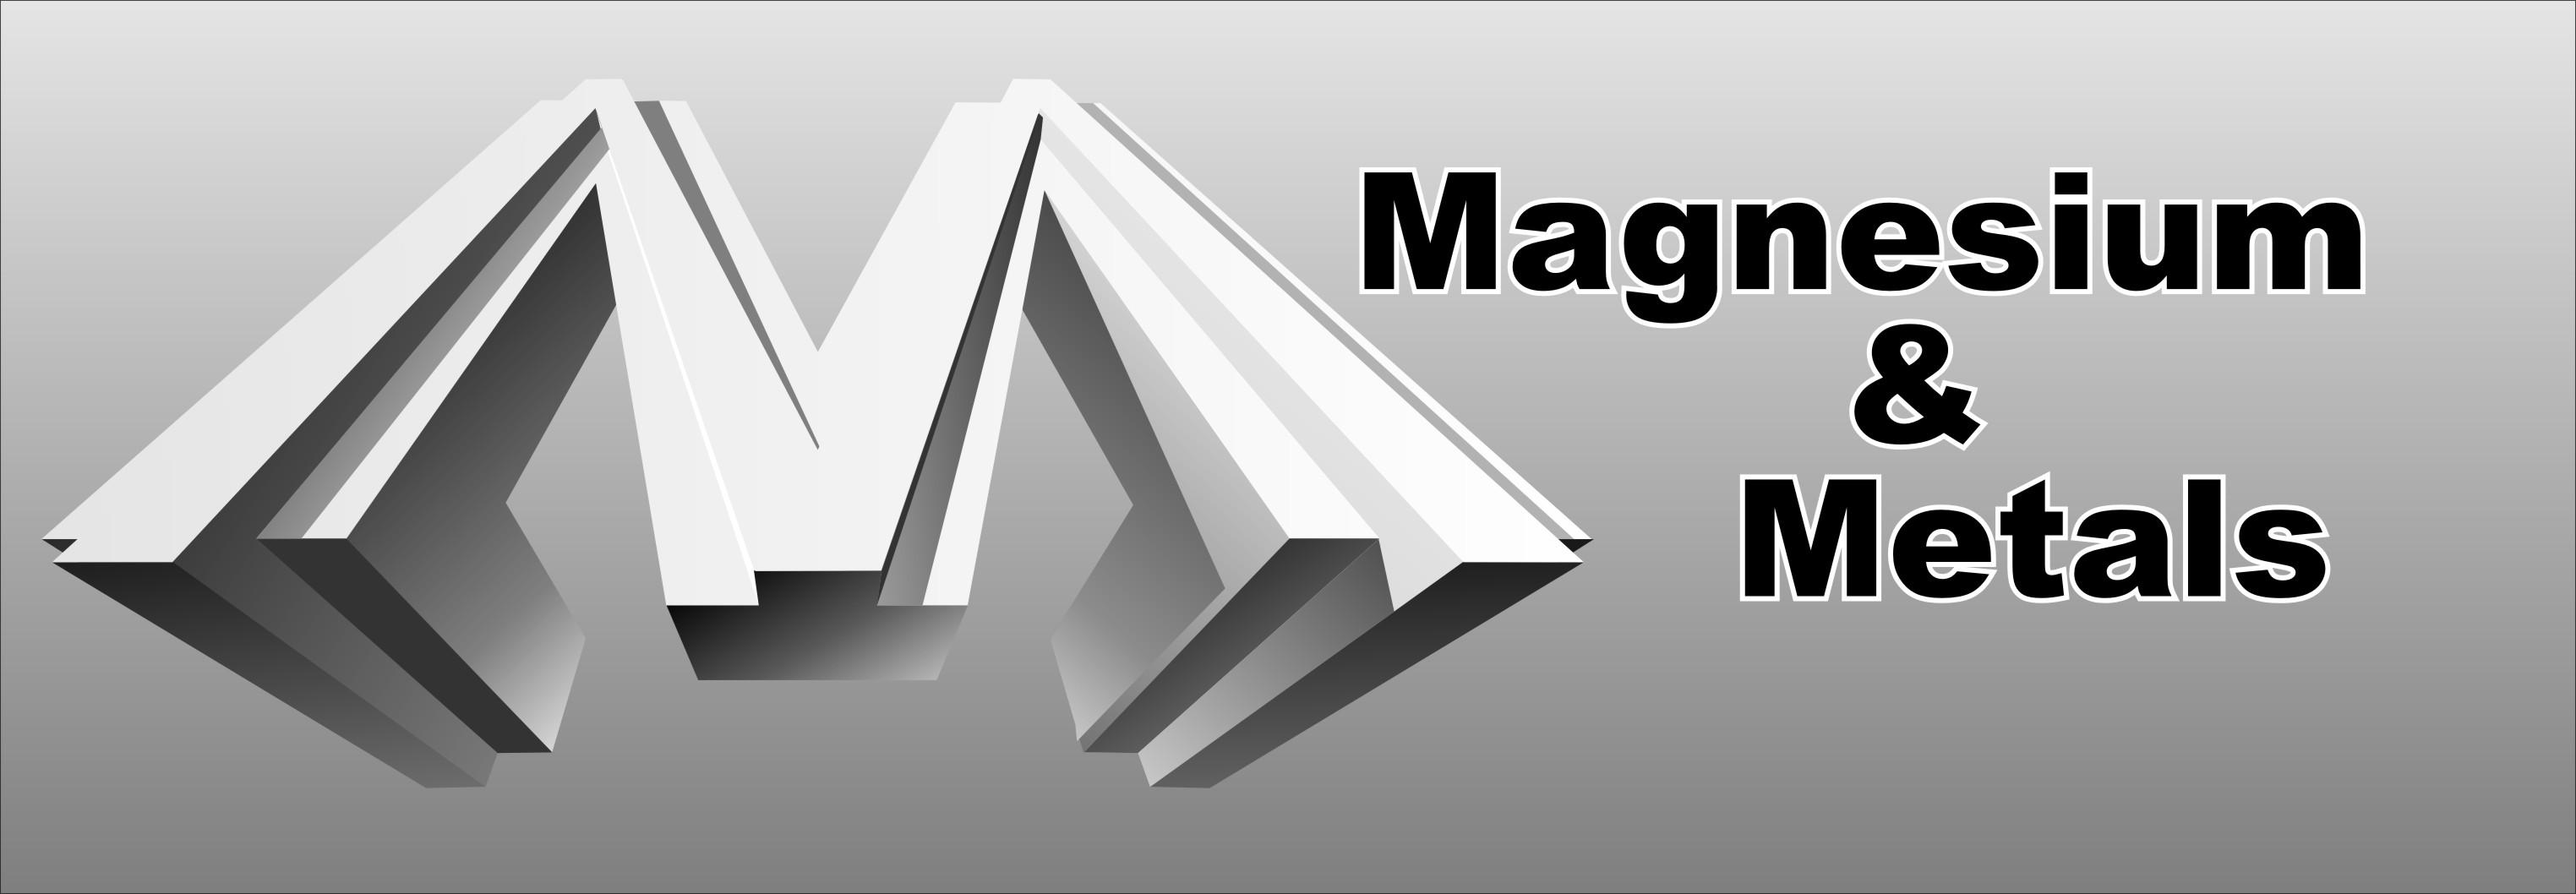 Логотип для проекта Magnesium&Metals фото f_4e7c0d808beca.jpg